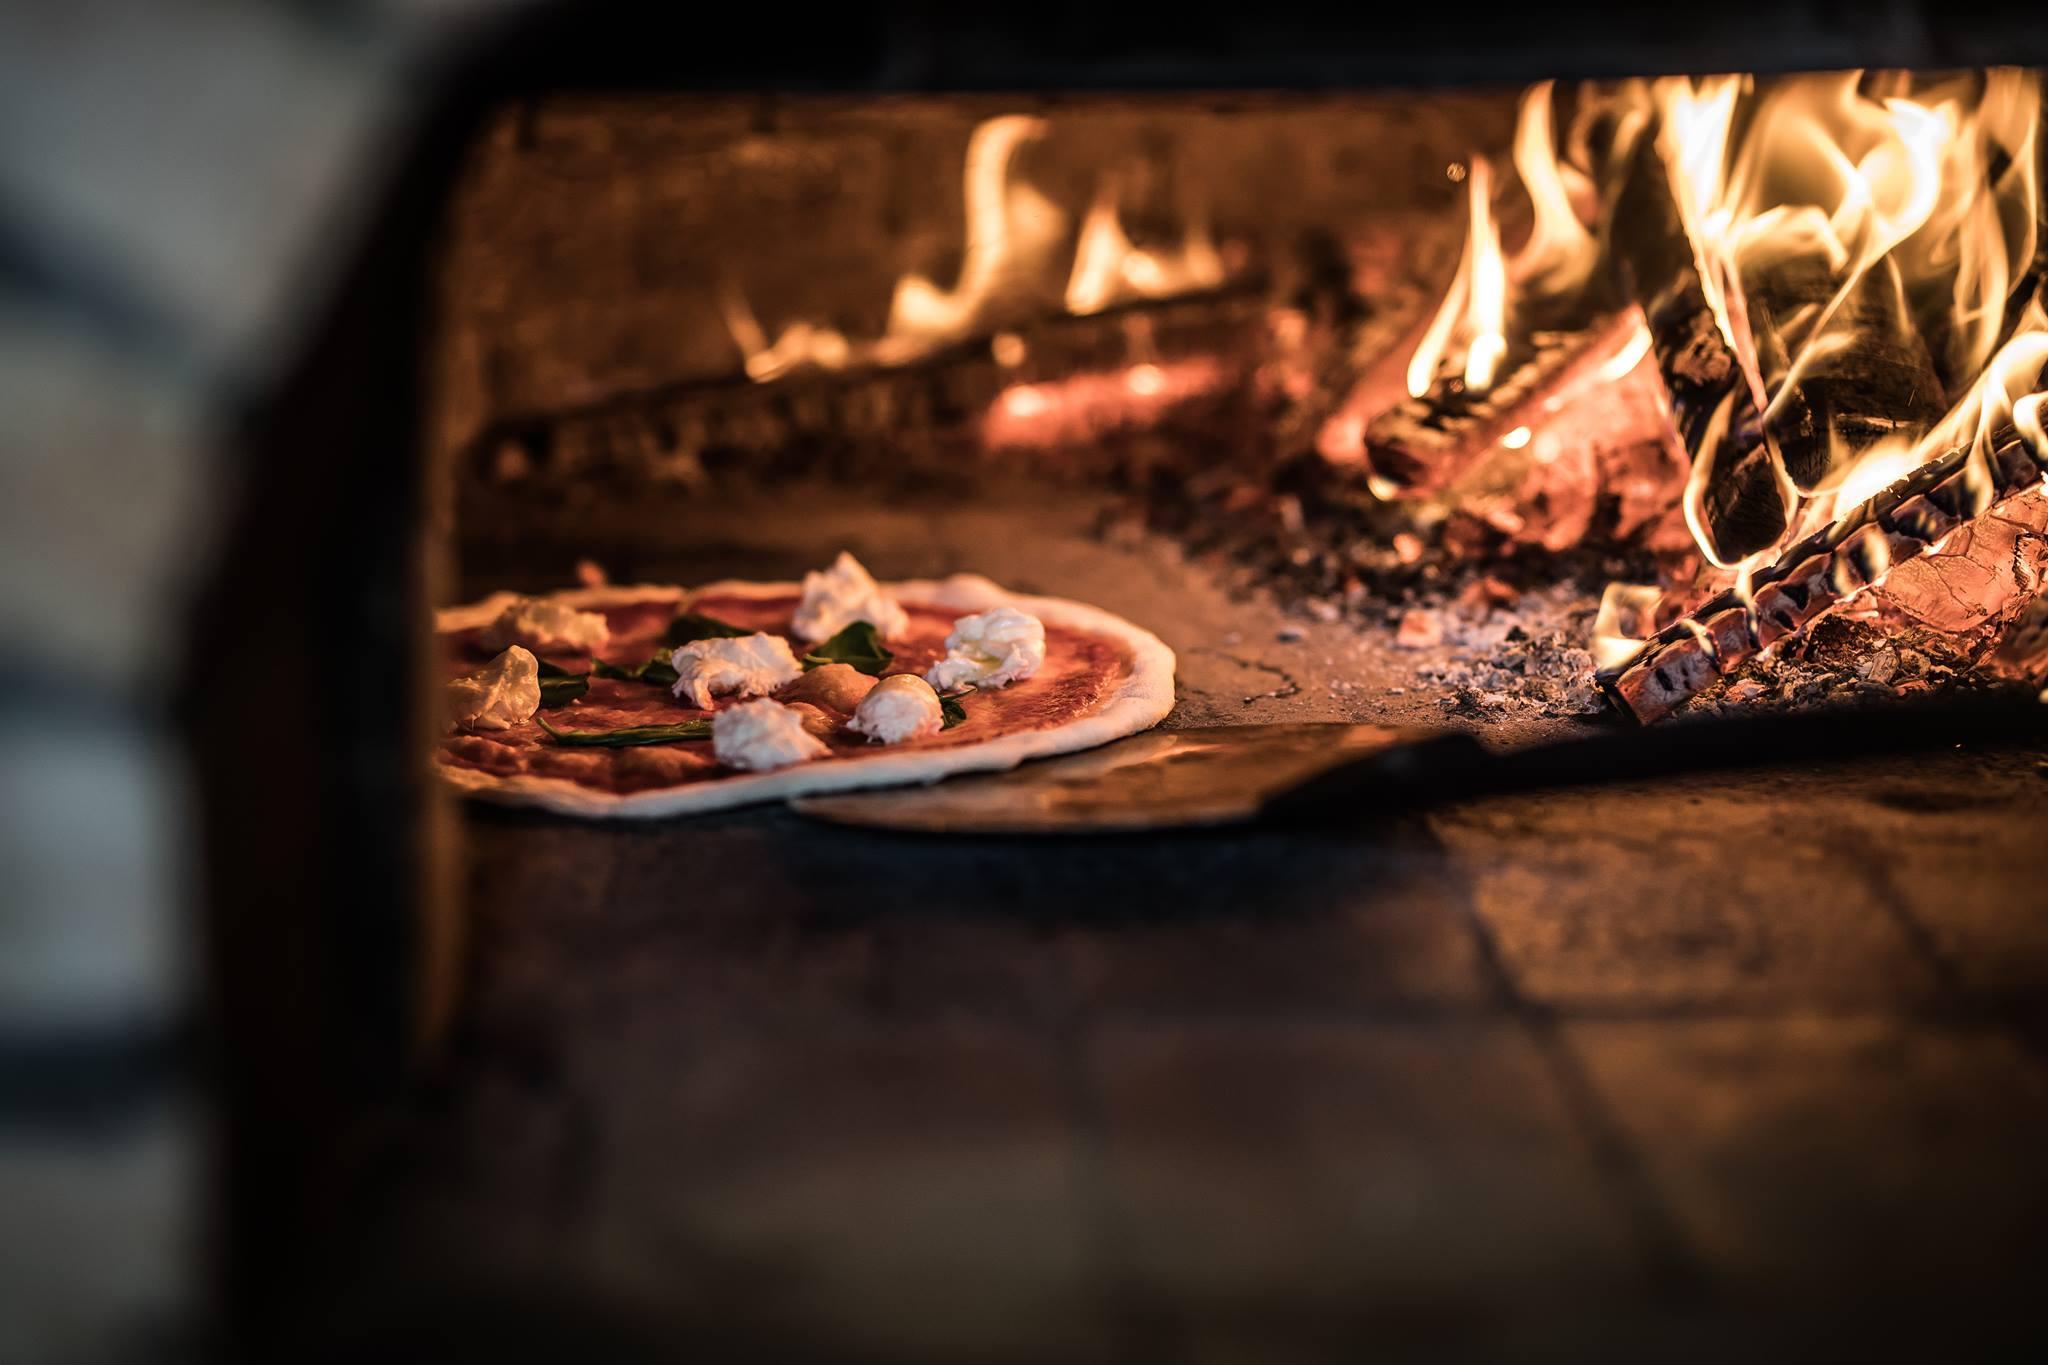 kemencés pizza best restaurant Hungary